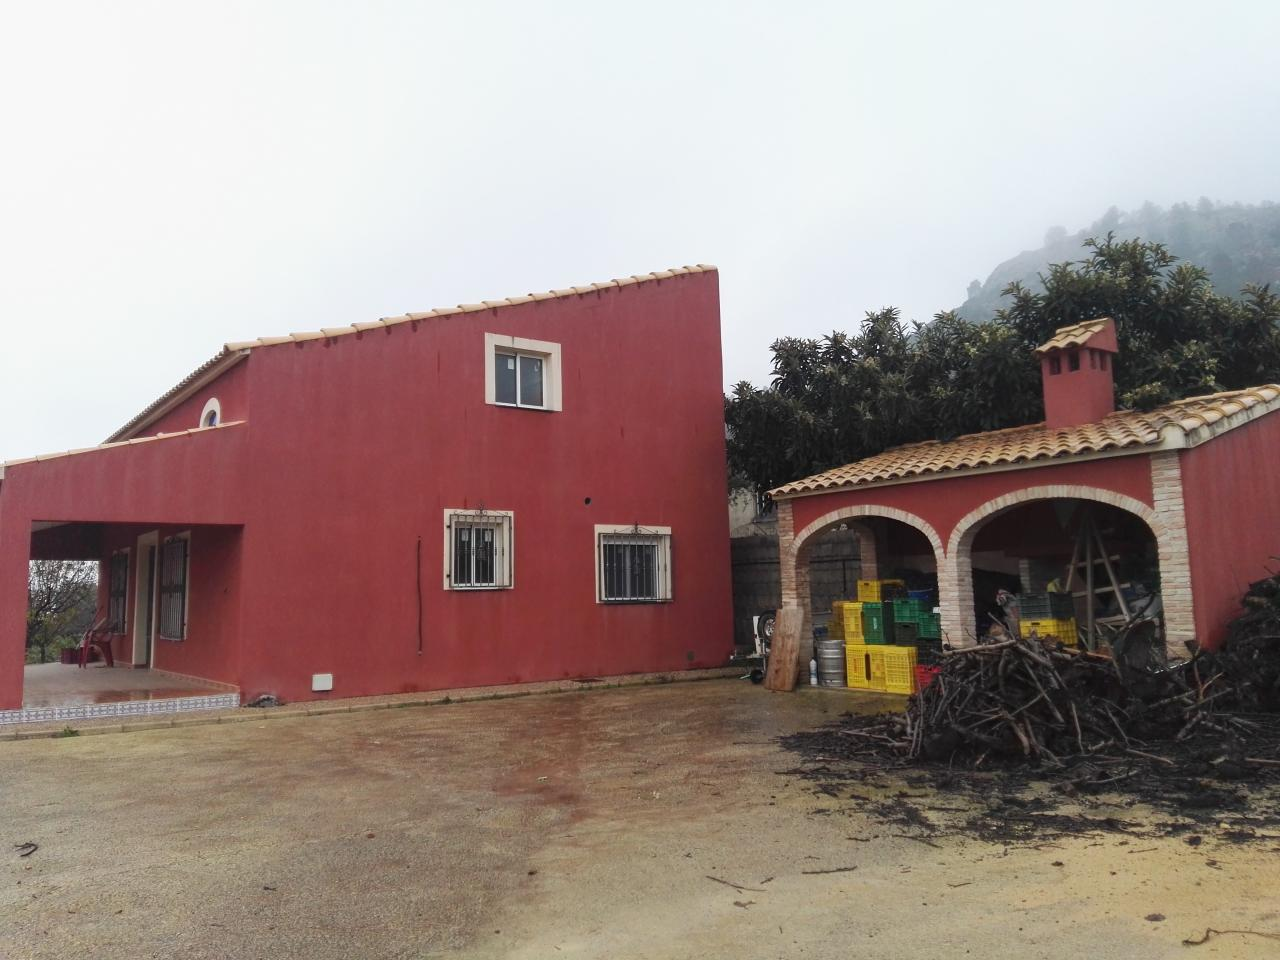 Casa de campo Salto Usero